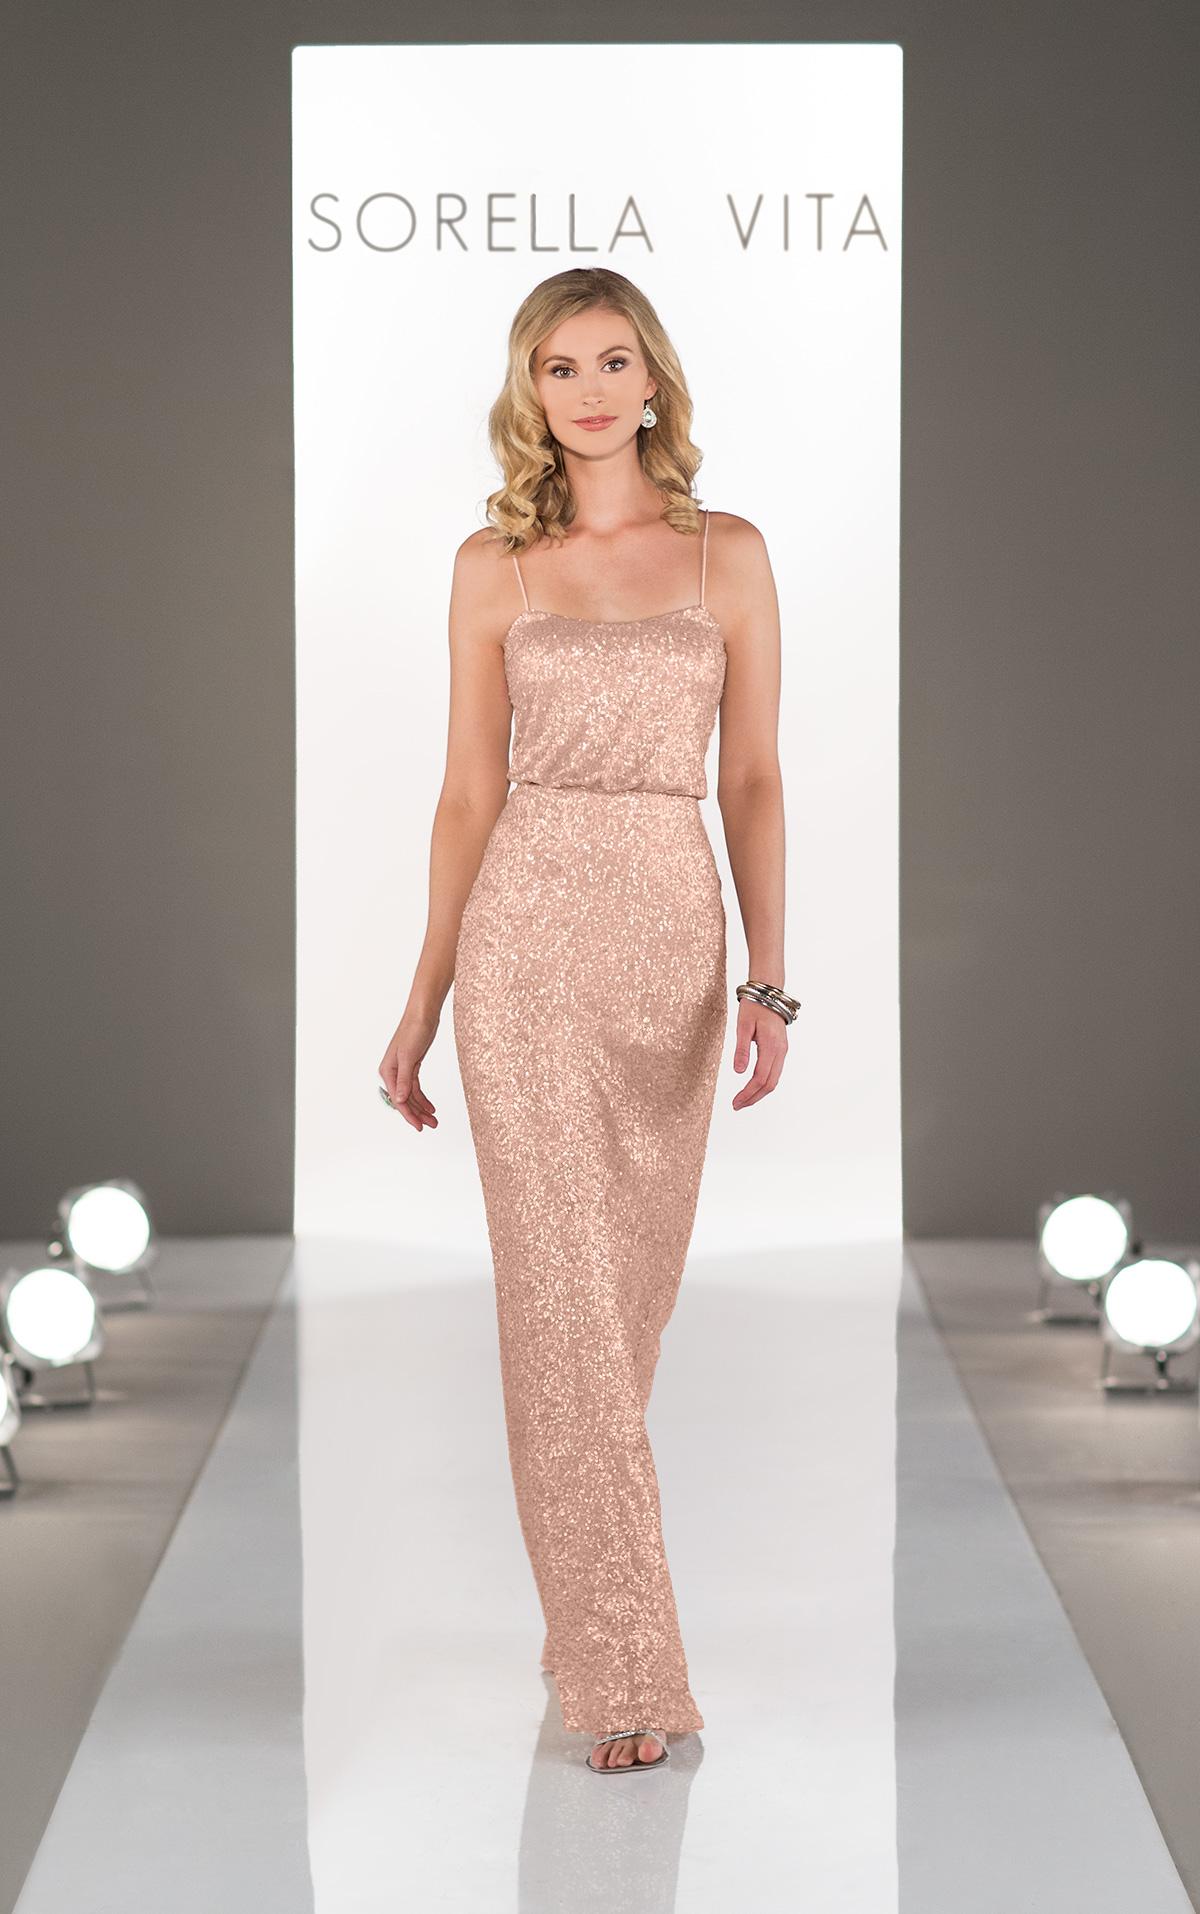 Sorella vita 8690 rose gold bridesmaid dress 259 for Metallic bridesmaid dresses wedding